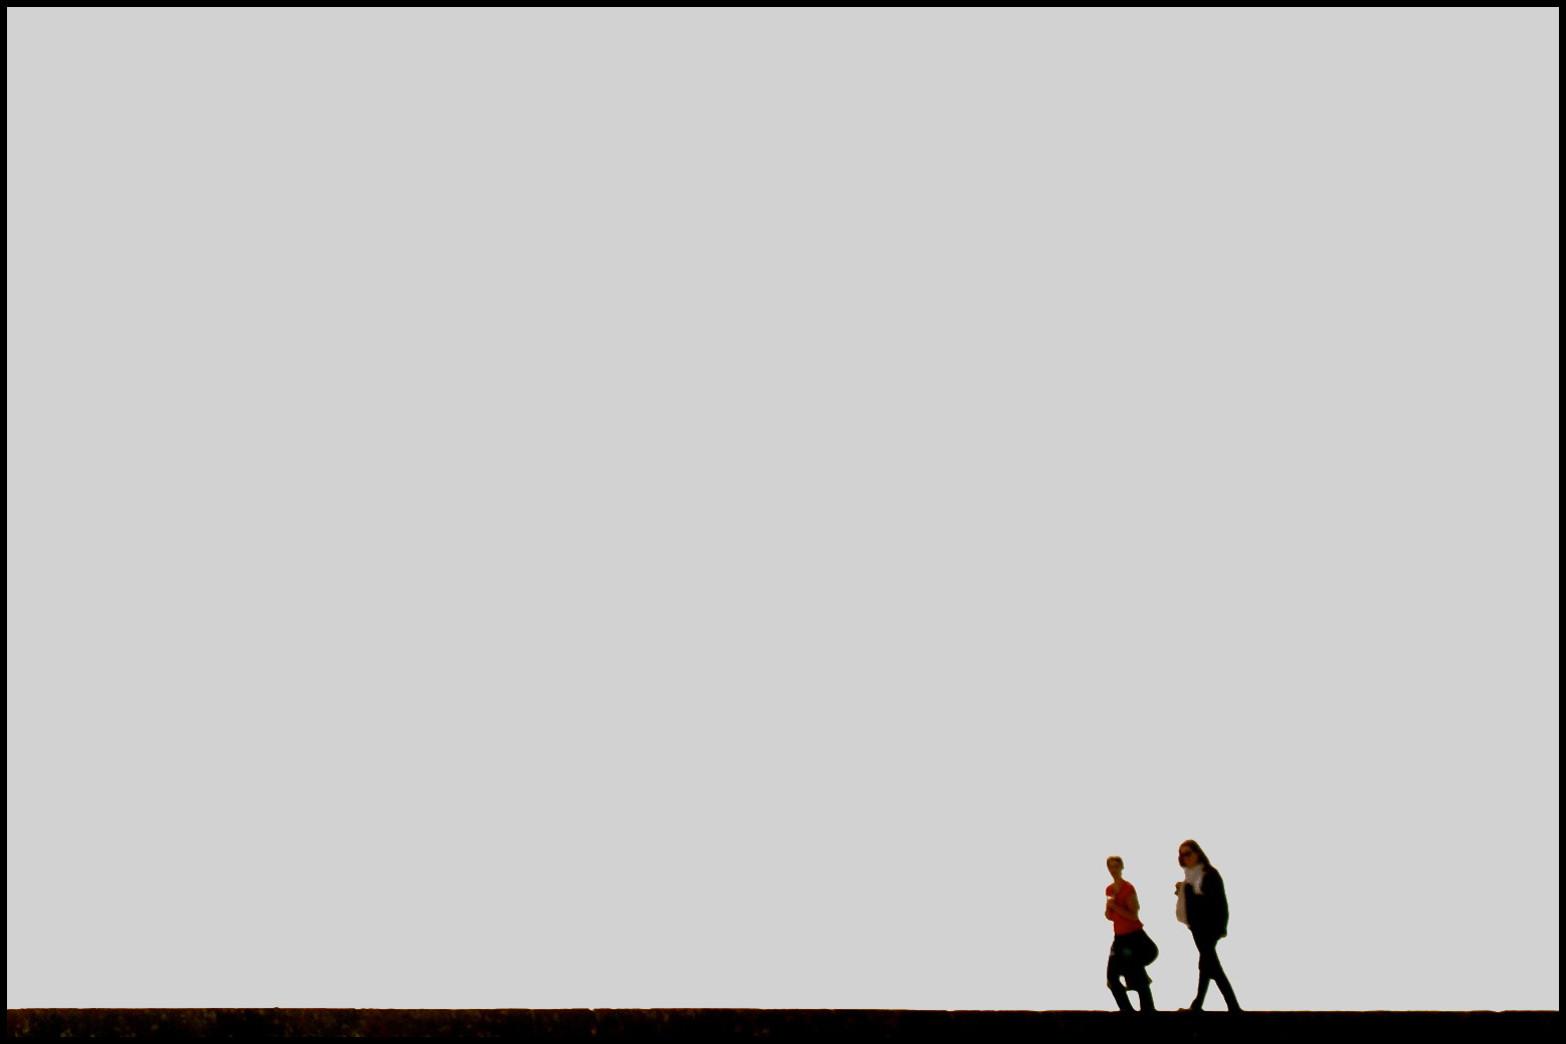 Fondos de pantalla : paisaje, cielo, silueta, texto, horizonte ...